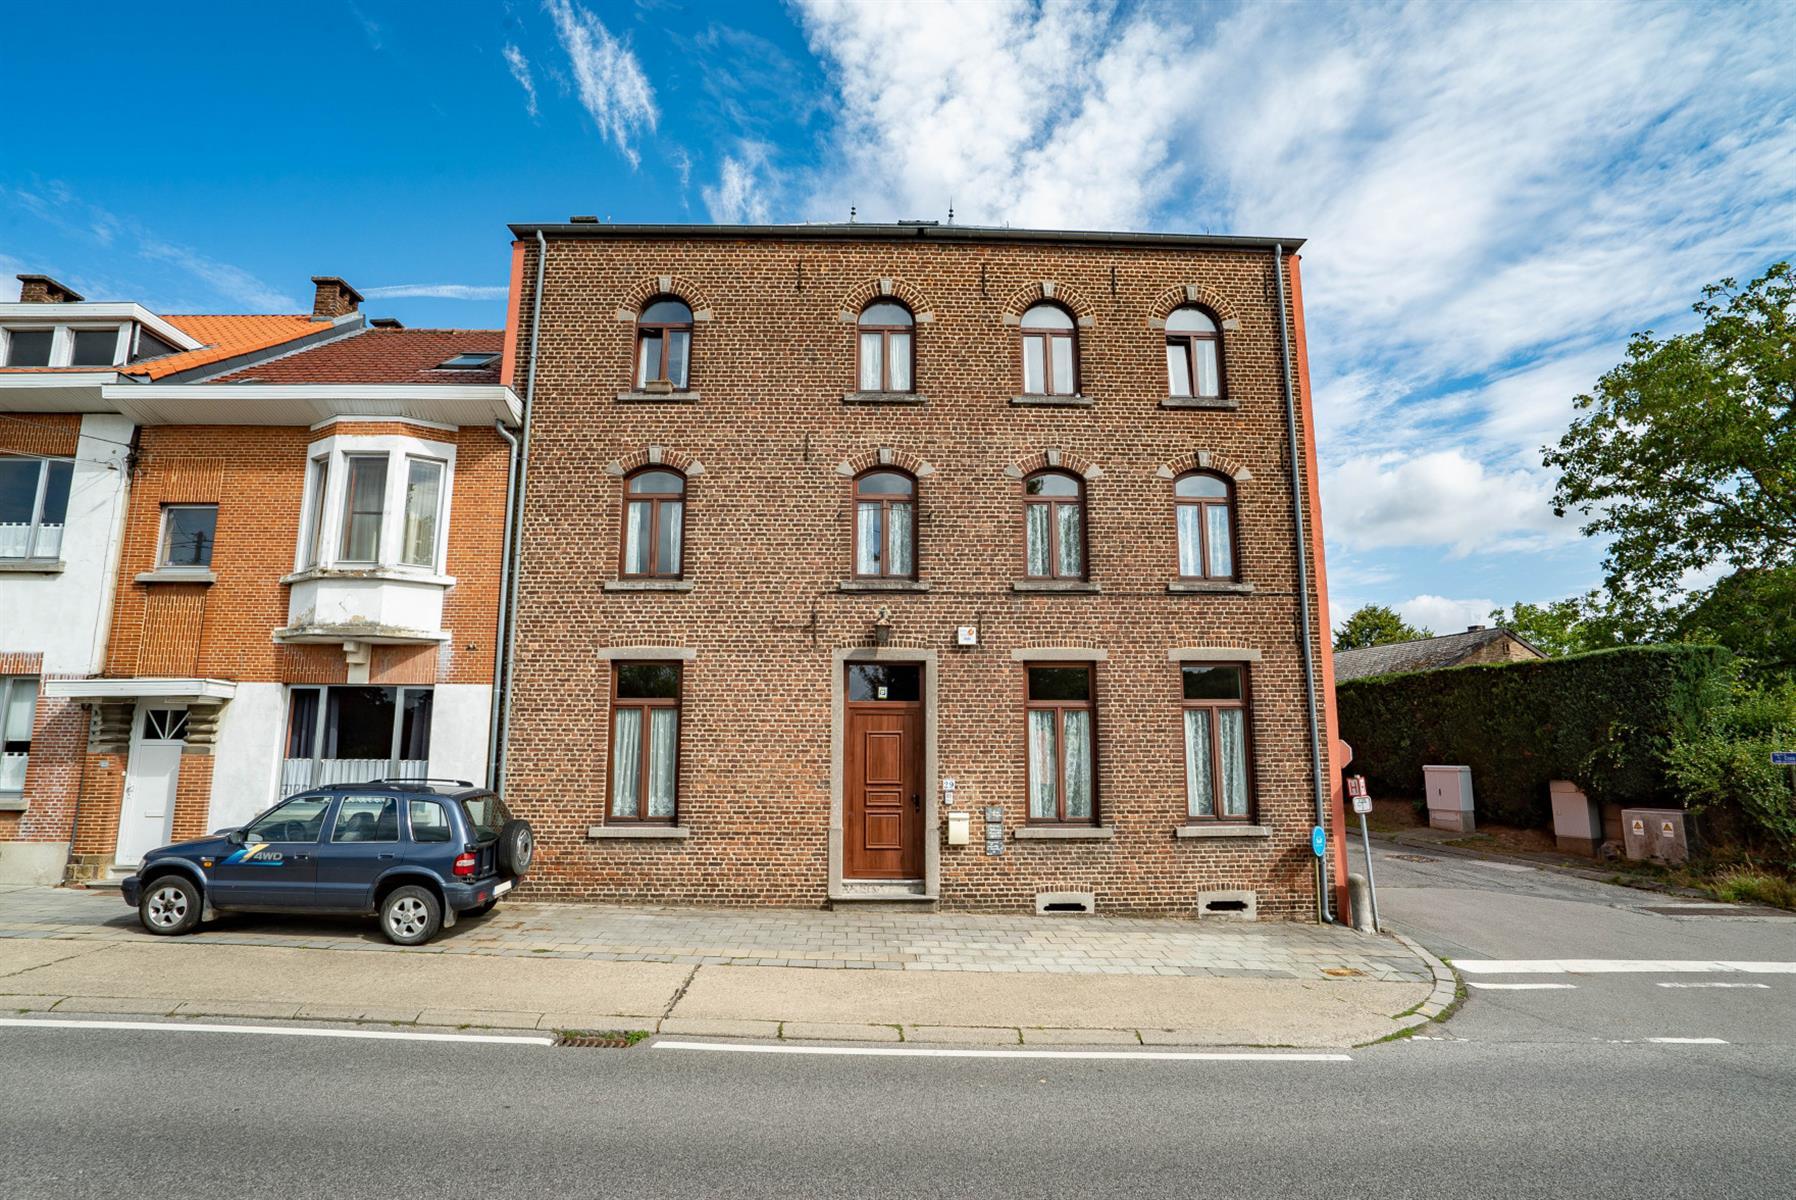 Maison - Bousval - #4131618-0